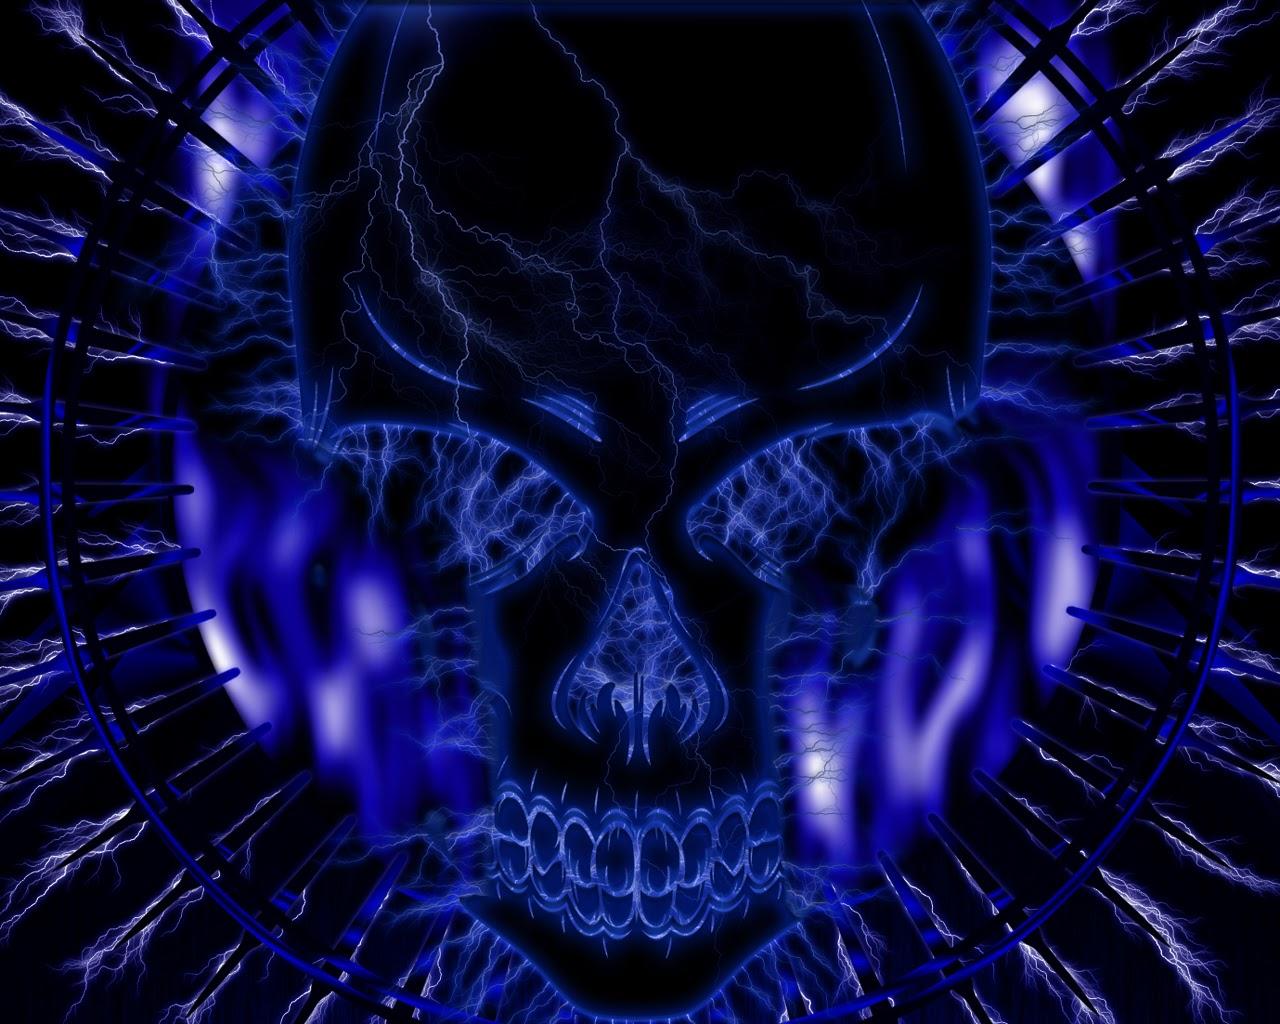 Fantastic   Wallpaper Home Screen Skull - blue+skull+photos++3  You Should Have_742989.jpg